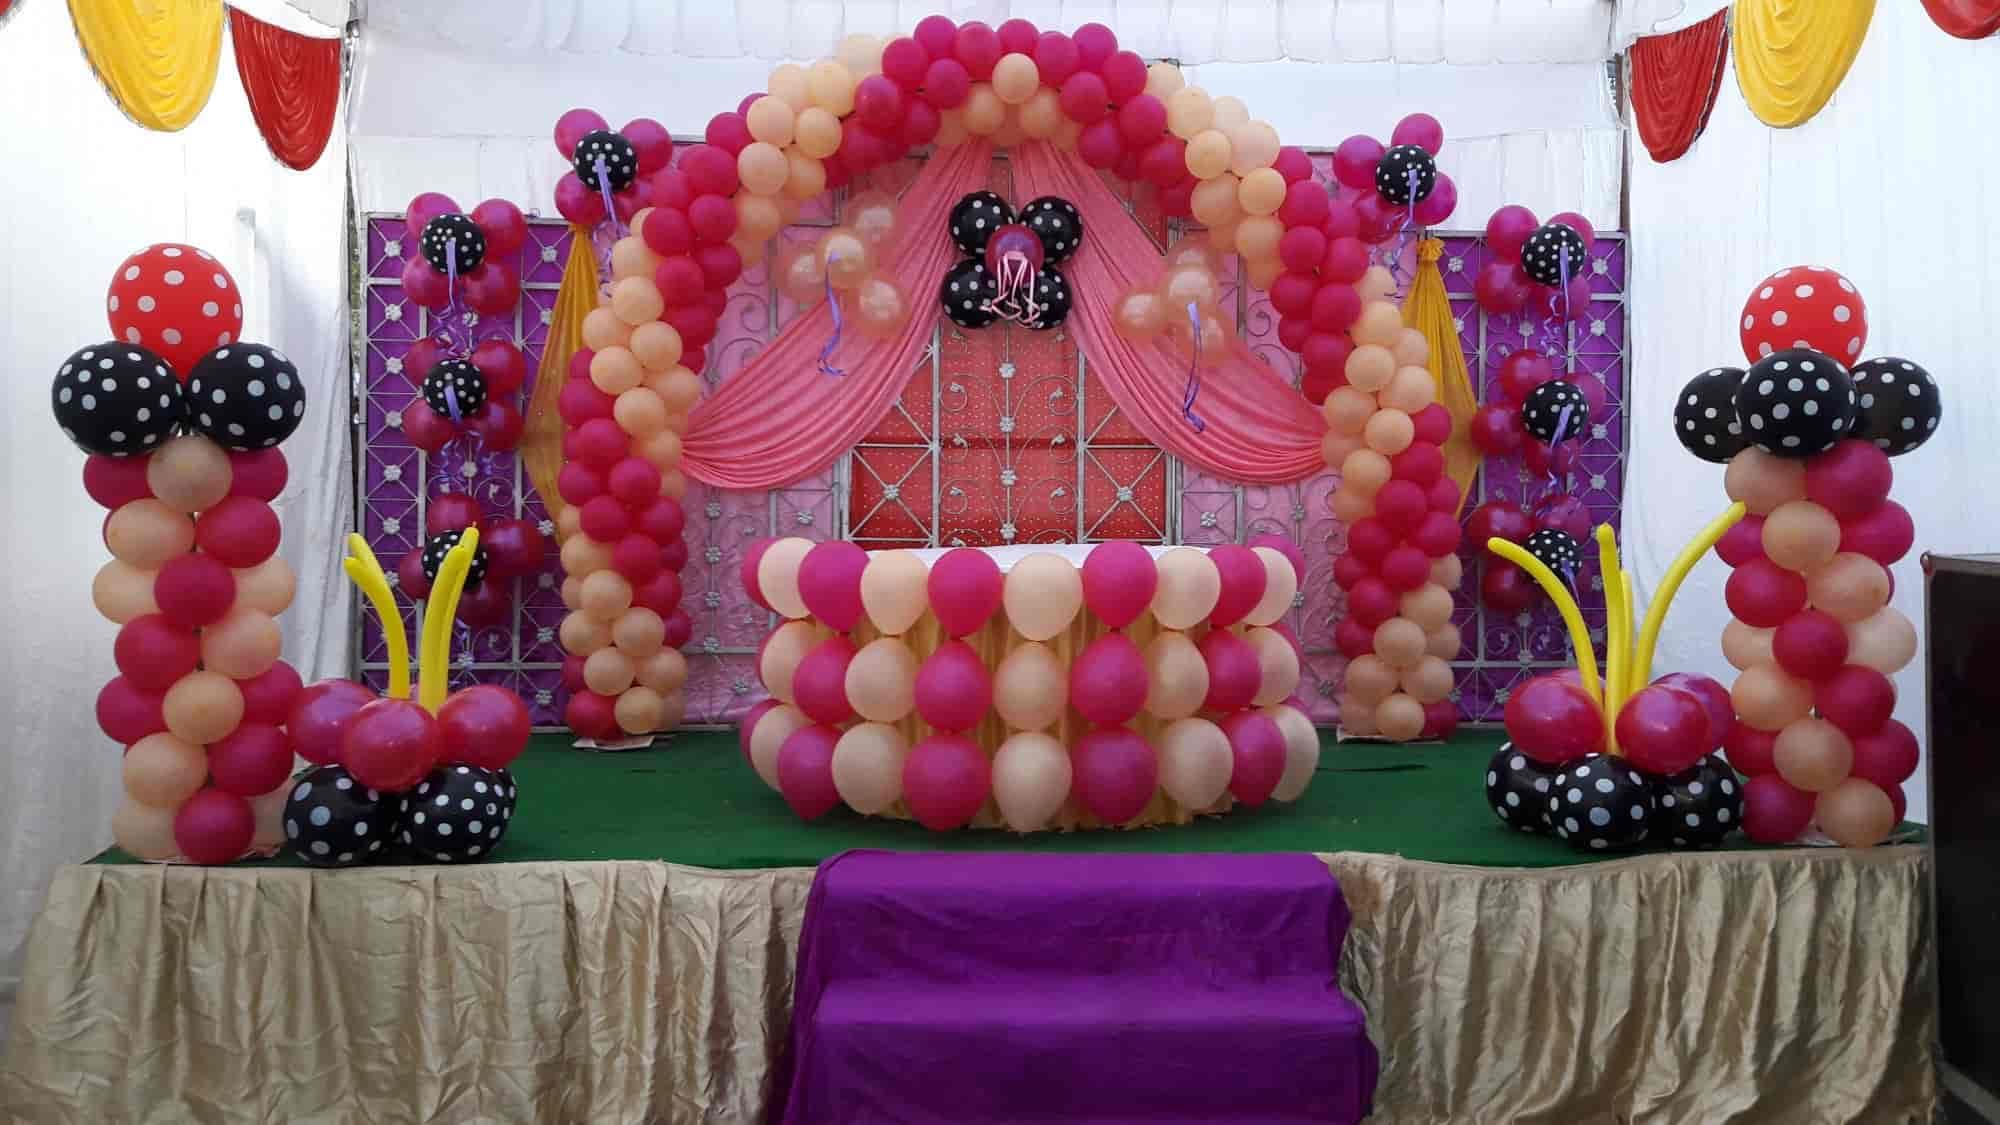 Balloon Decoration Part - 29: ... Balloon Decoration - Saini Balloon Decoration U0026 Flower Works Photos,  Gwalior City, ...